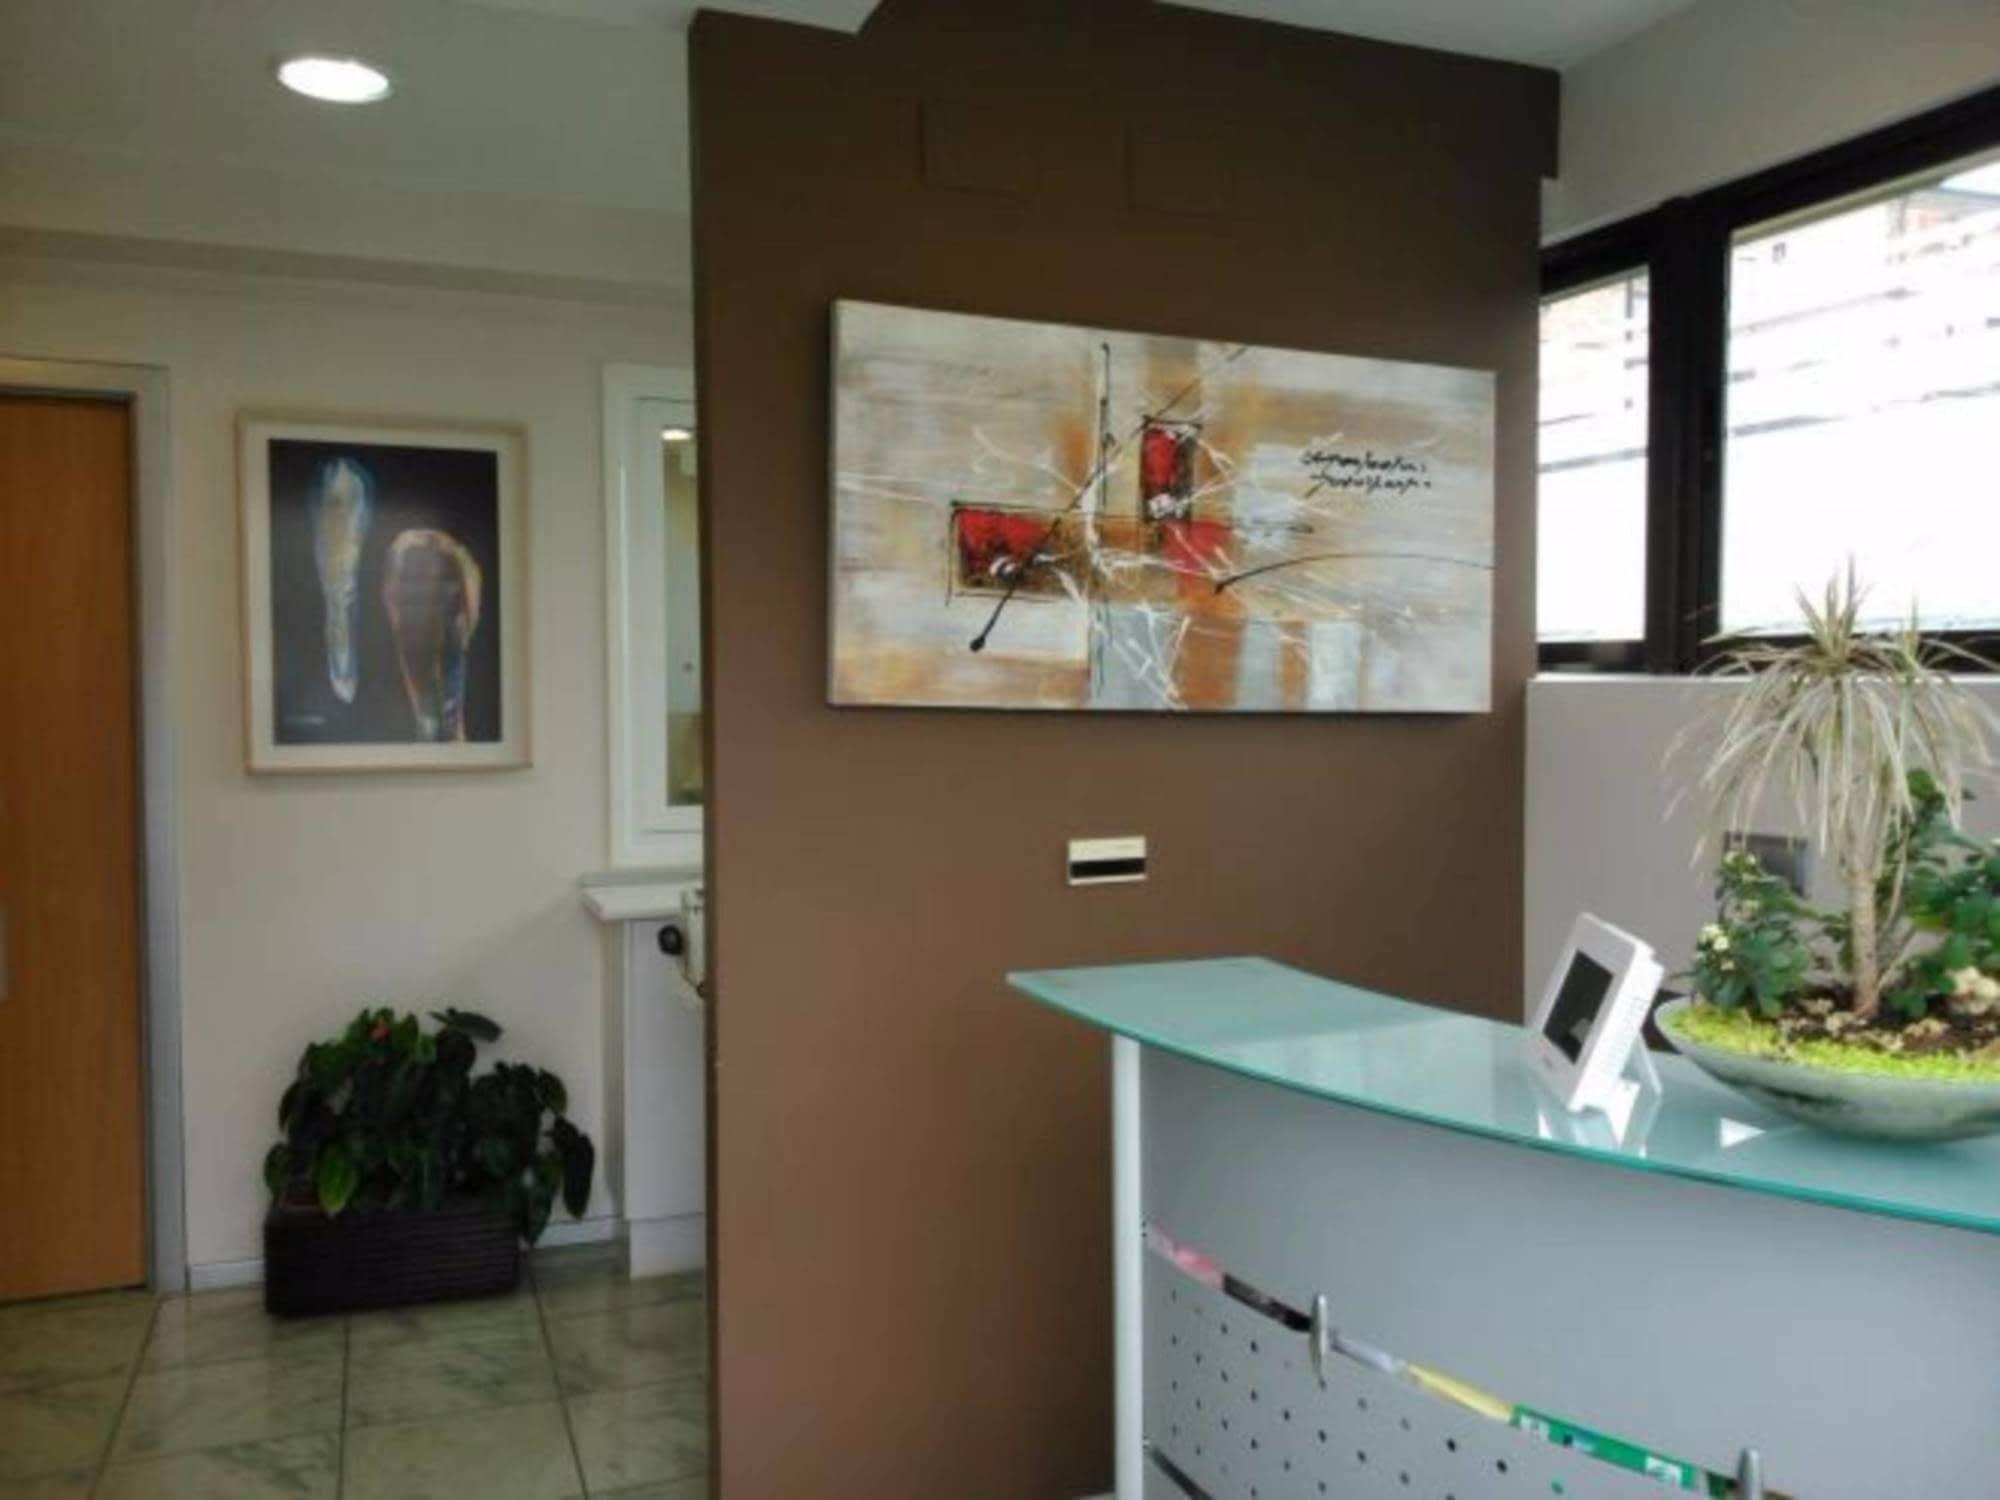 Servicios odontológicos completos Lazkao